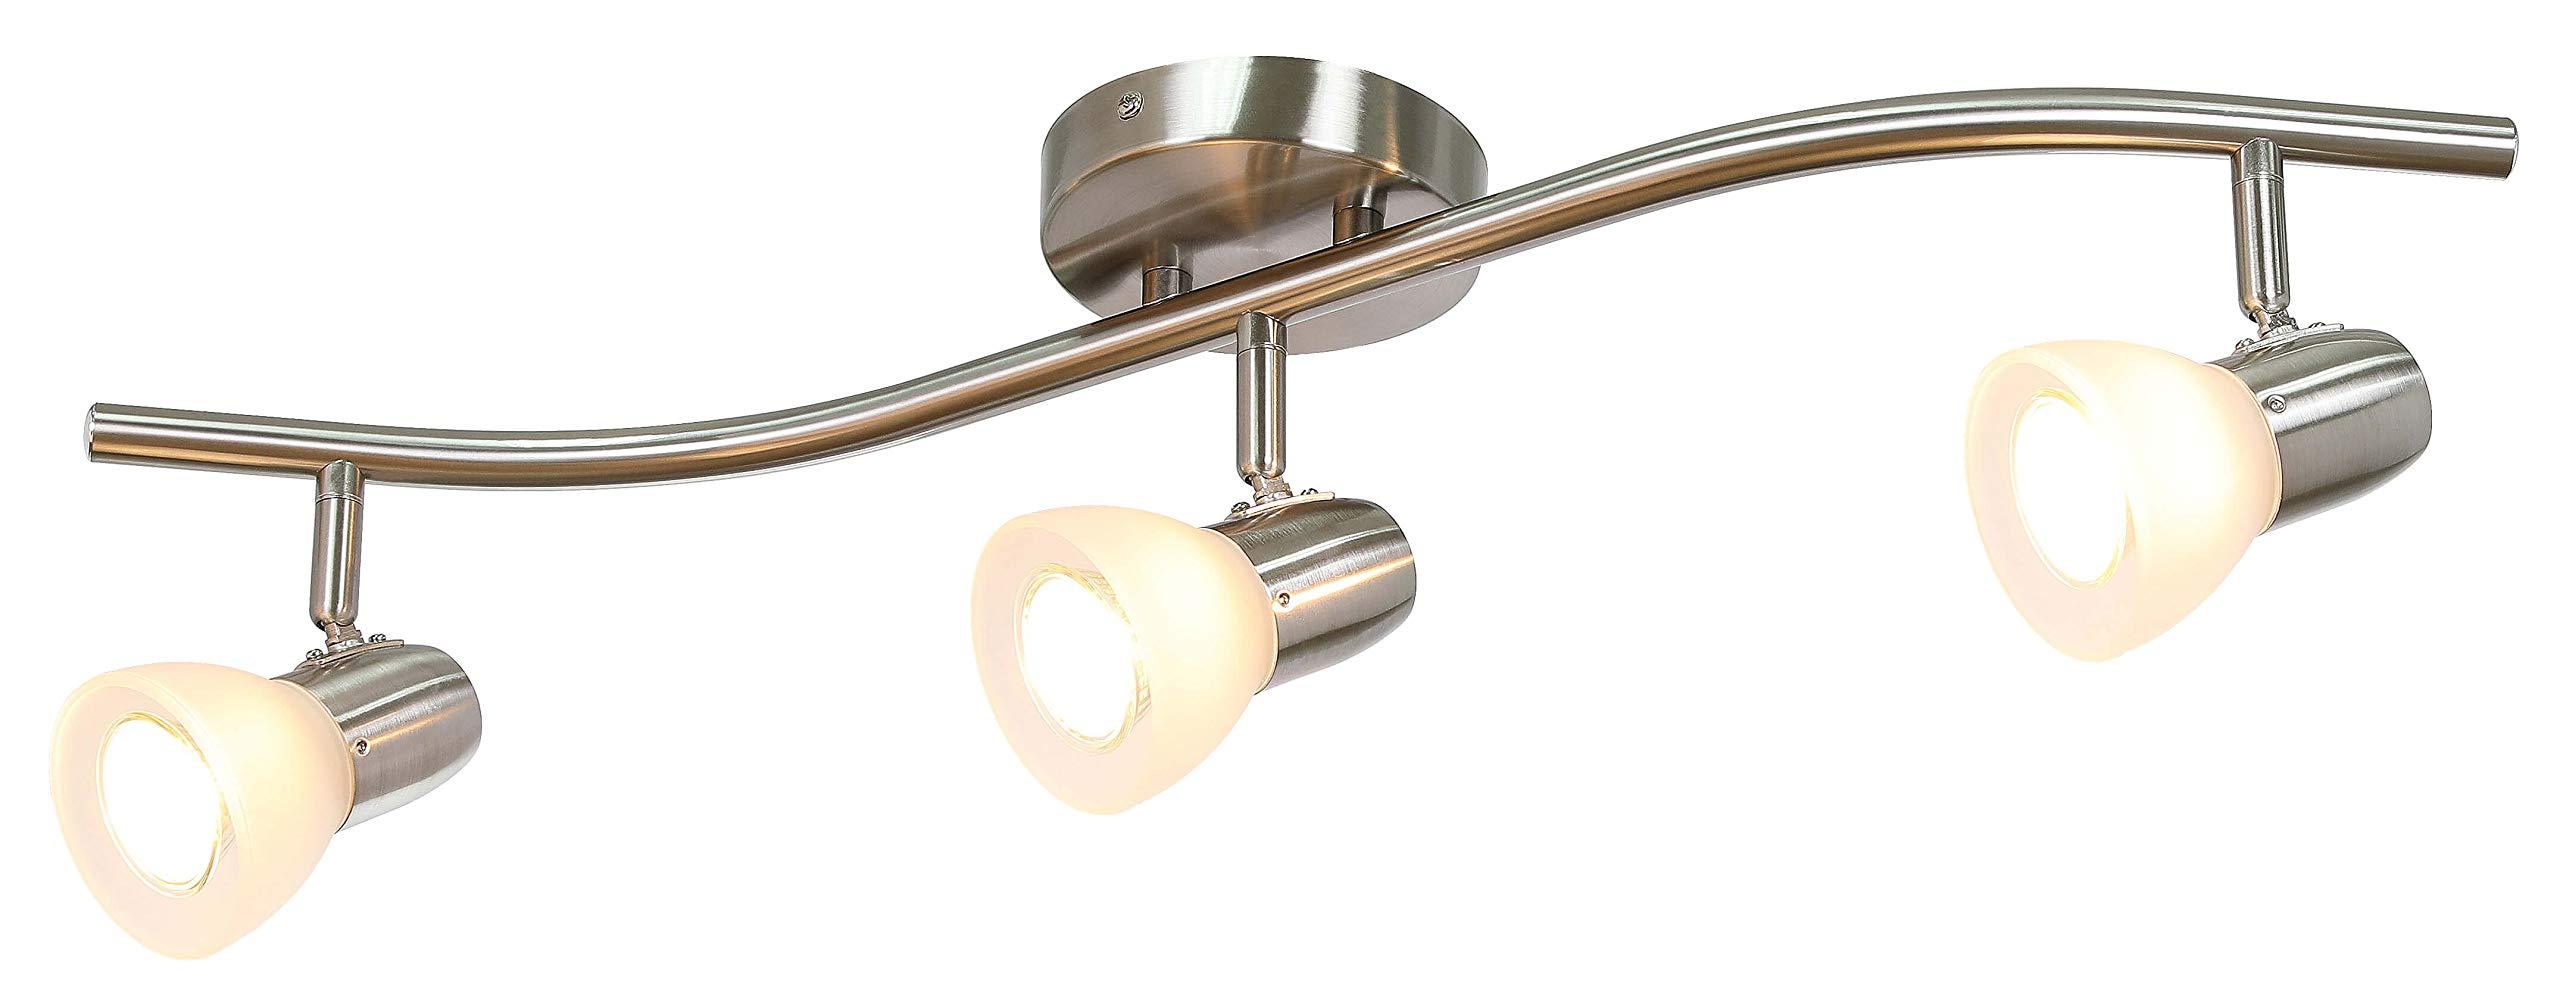 XiNBEi Lighting Track Lighting, 3 Light Track Light, Modern S-Shaped Track Light Bar with GU10 Bulb Brushed Nickel Finish XB-TR1223-3